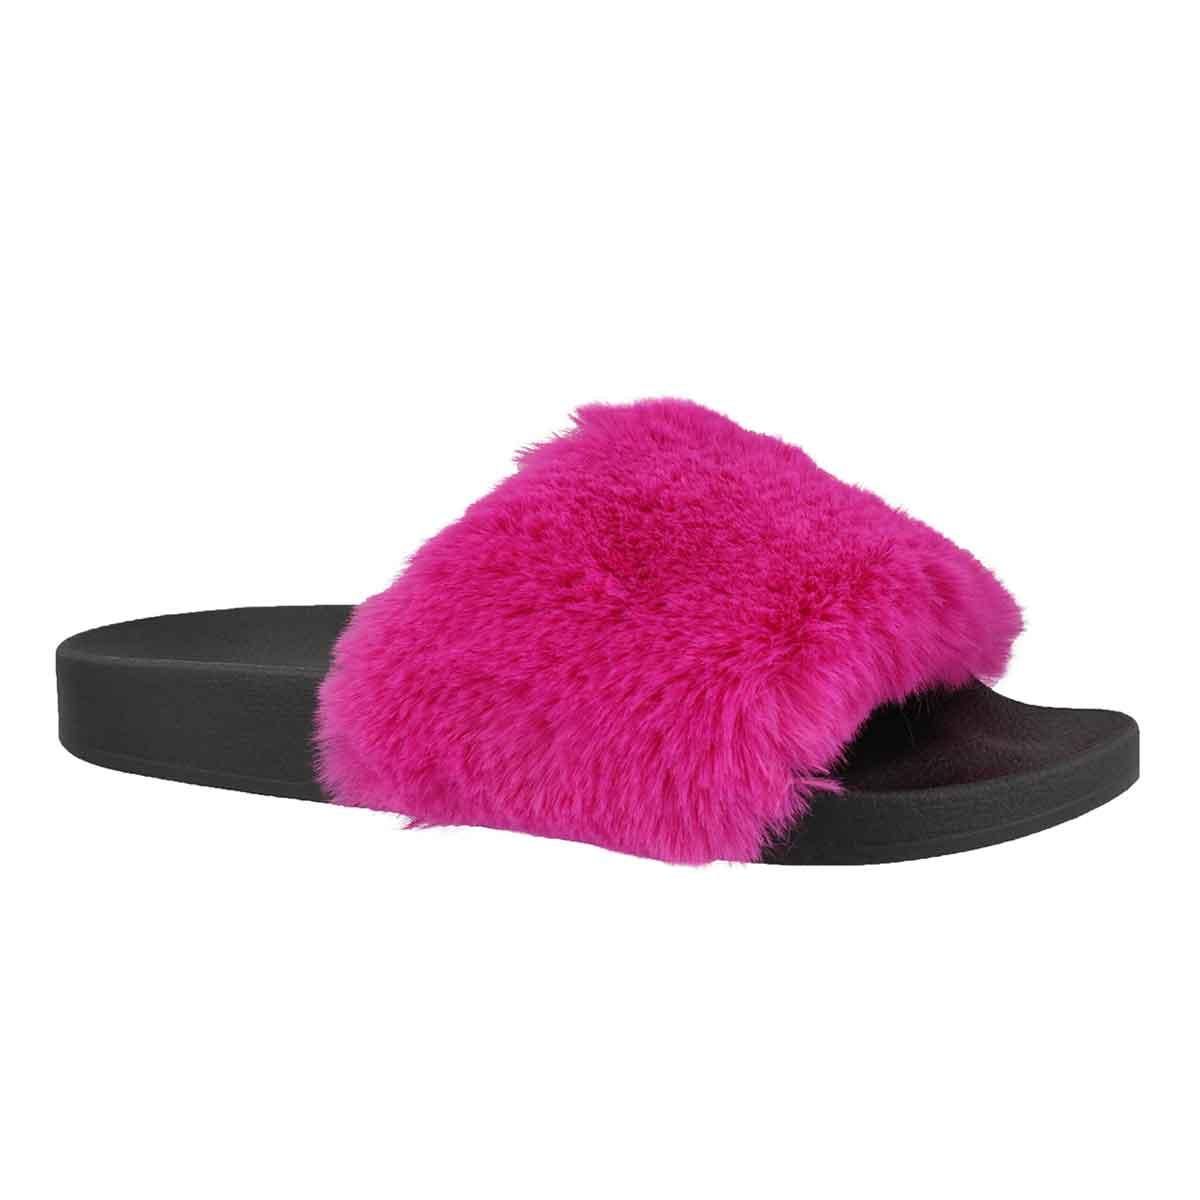 Women's SOFTEY fuchsia fur slide sandals